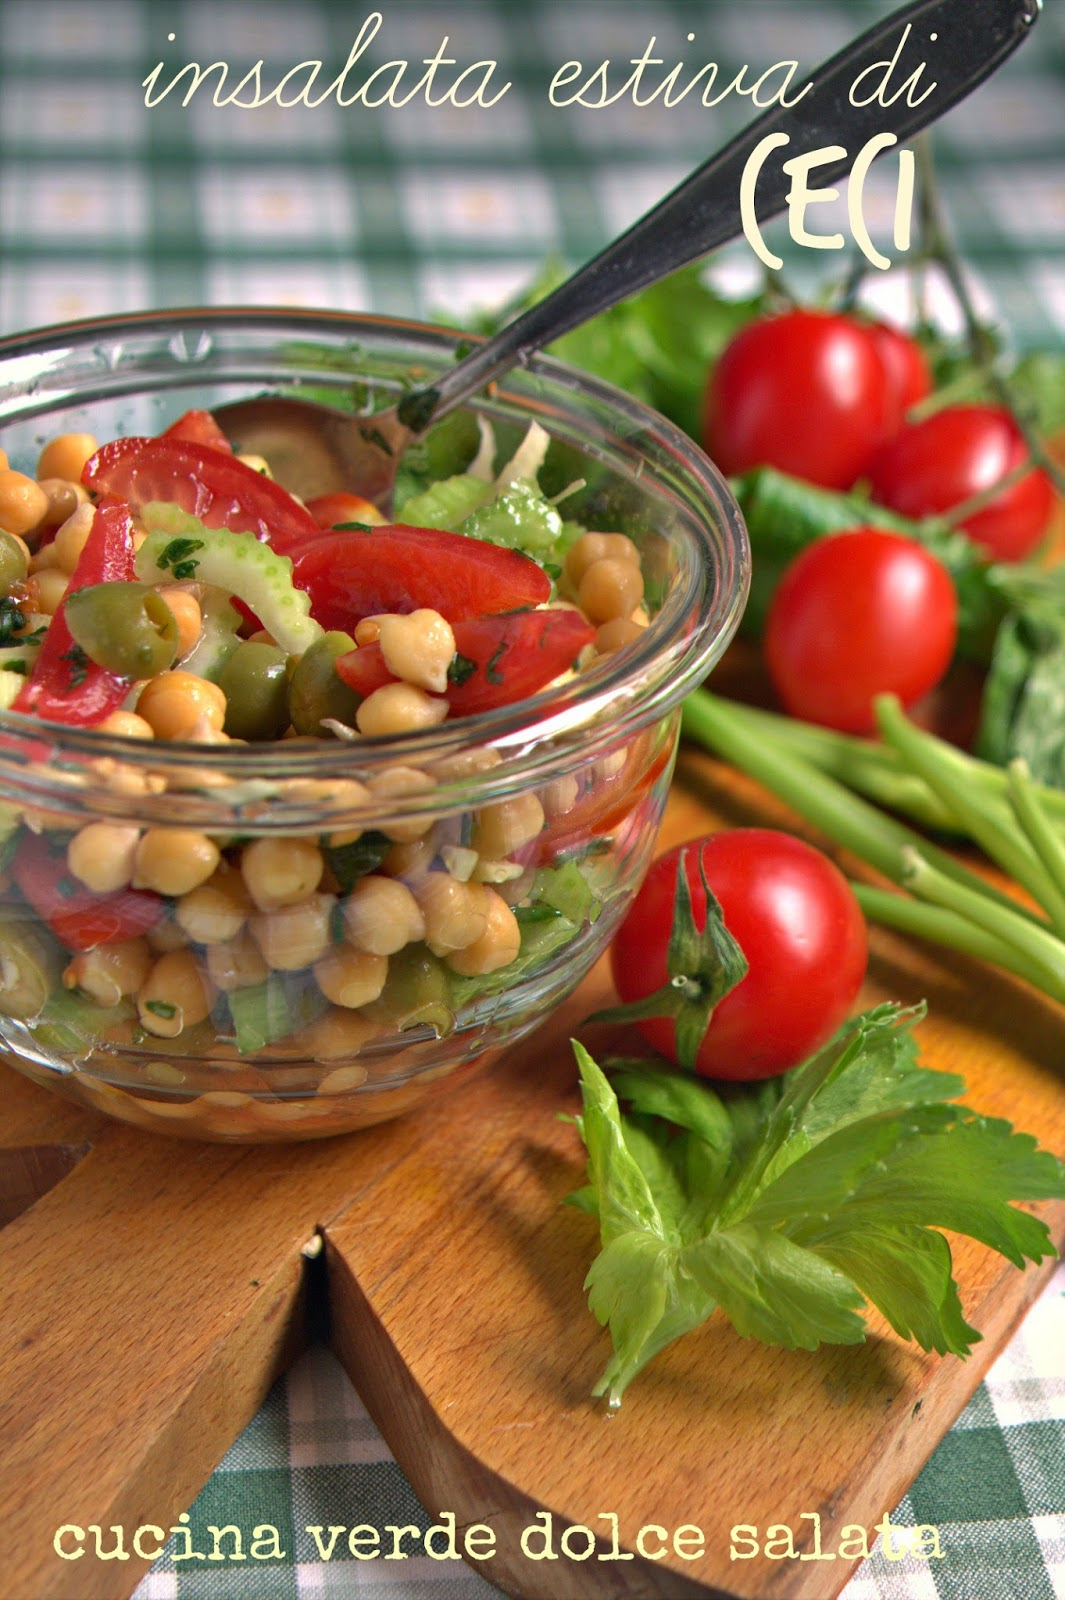 Cucina verde dolce salata insalata estiva di ceci for Cucina dolce